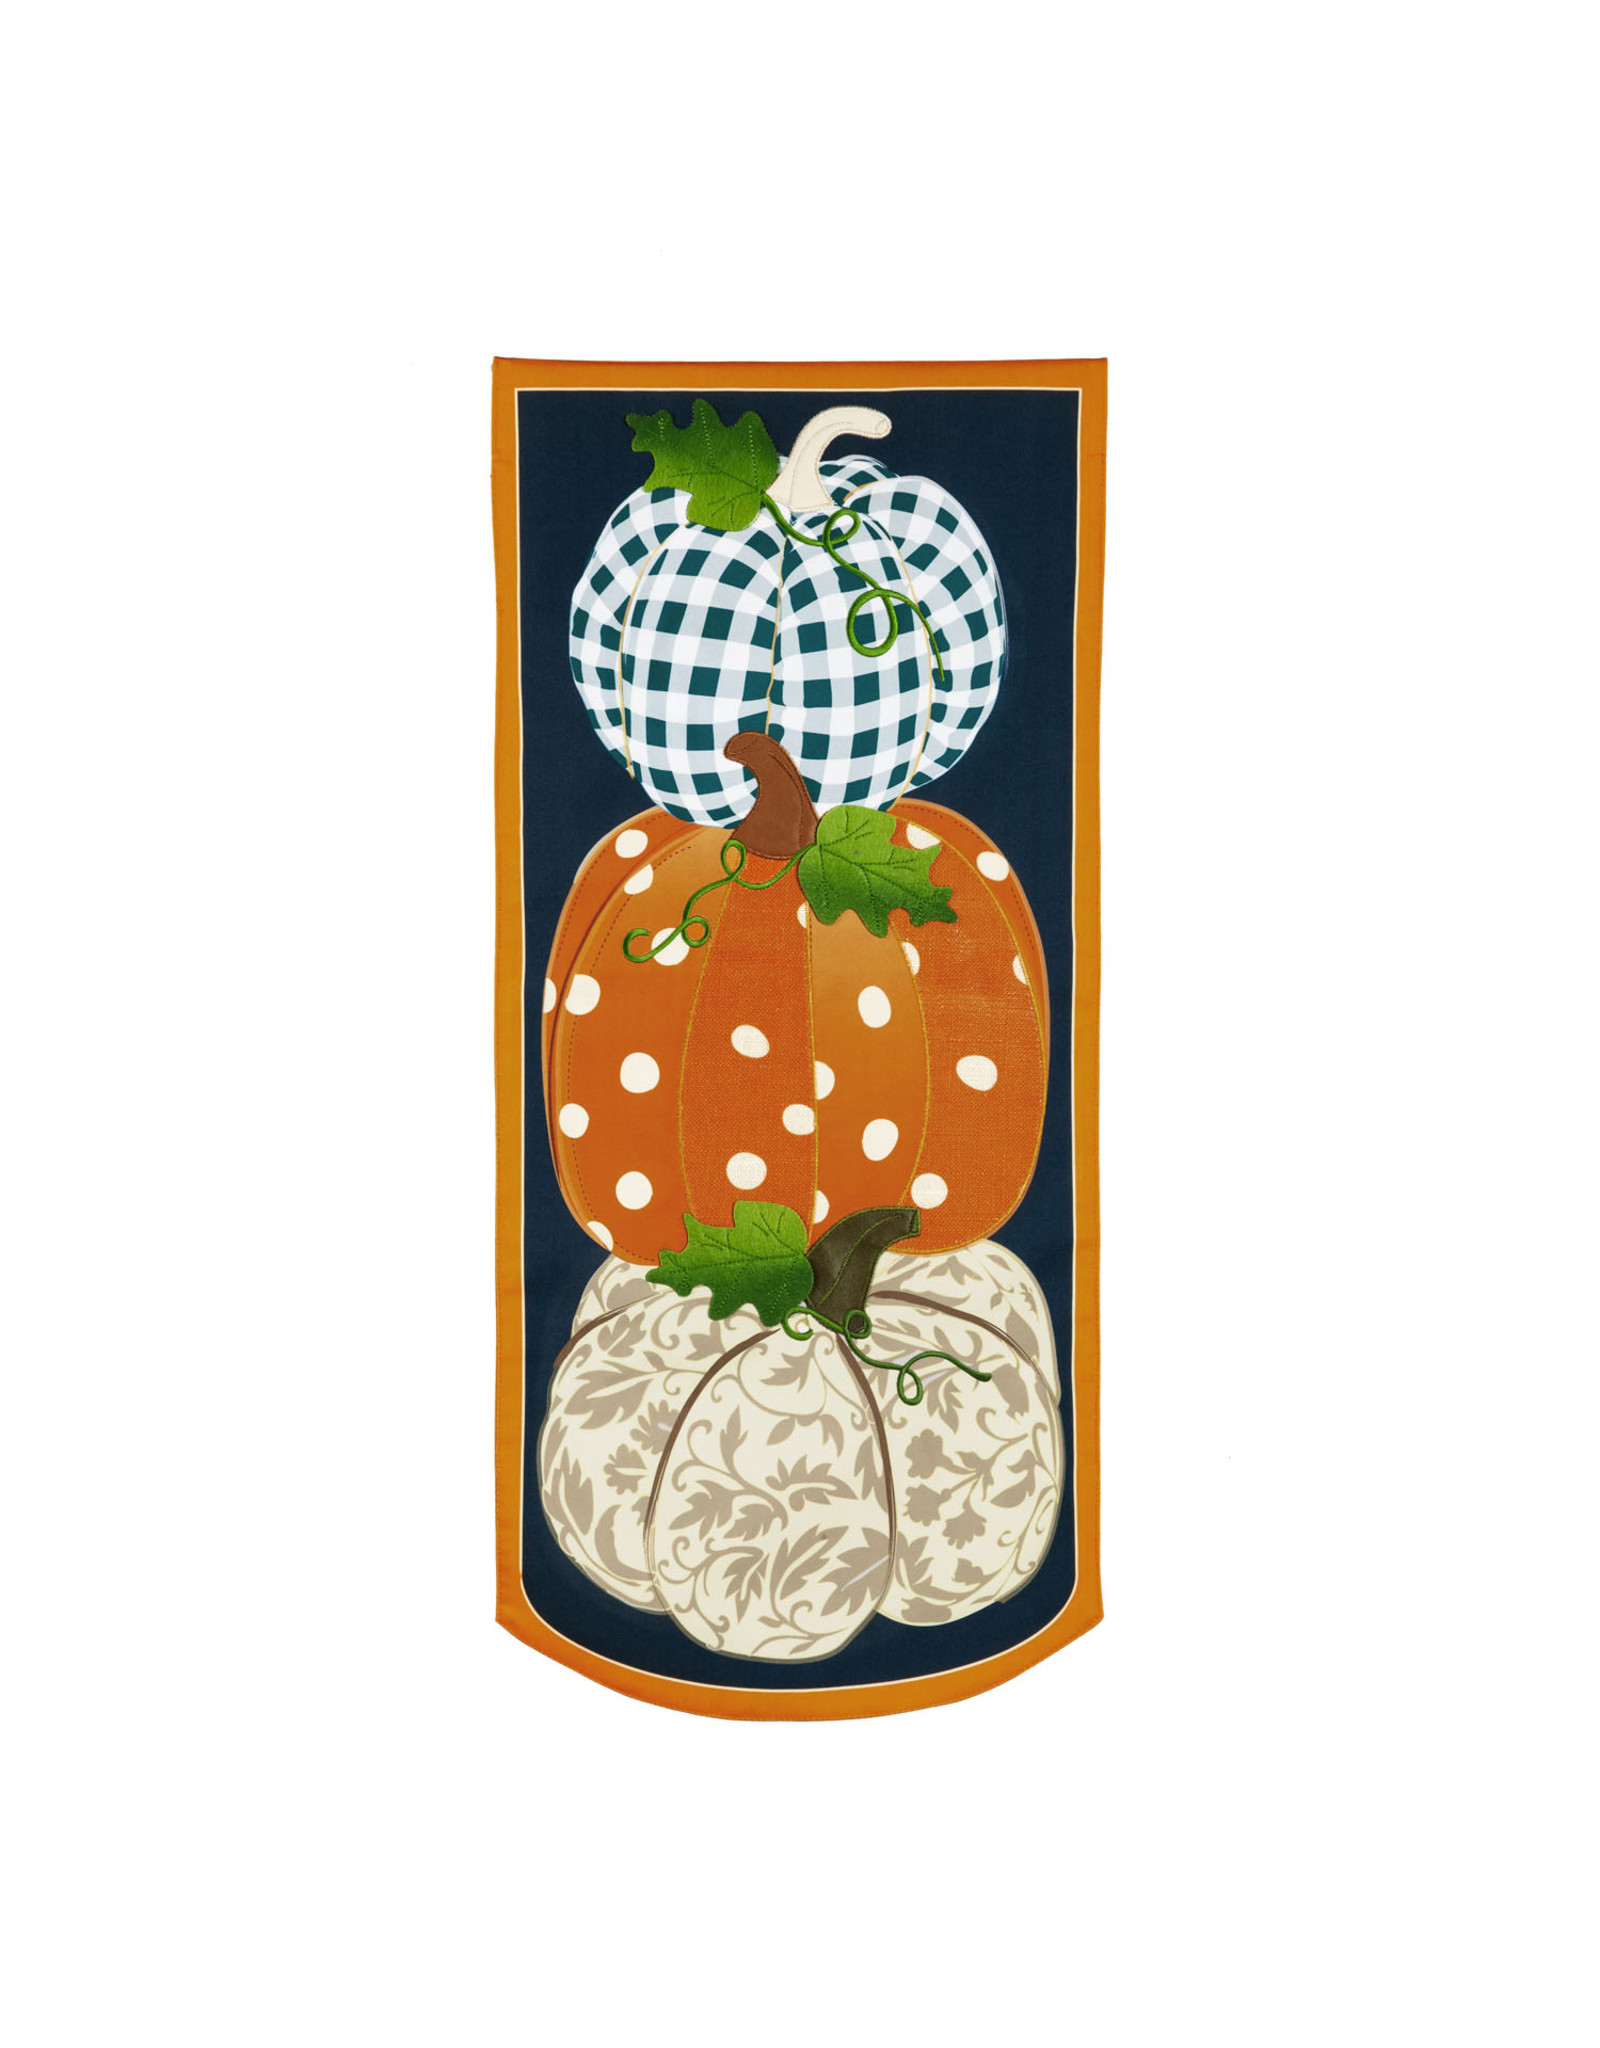 Evergreen Enterprises Patterned Pumpkins Everlasting Impressions Textile Décor